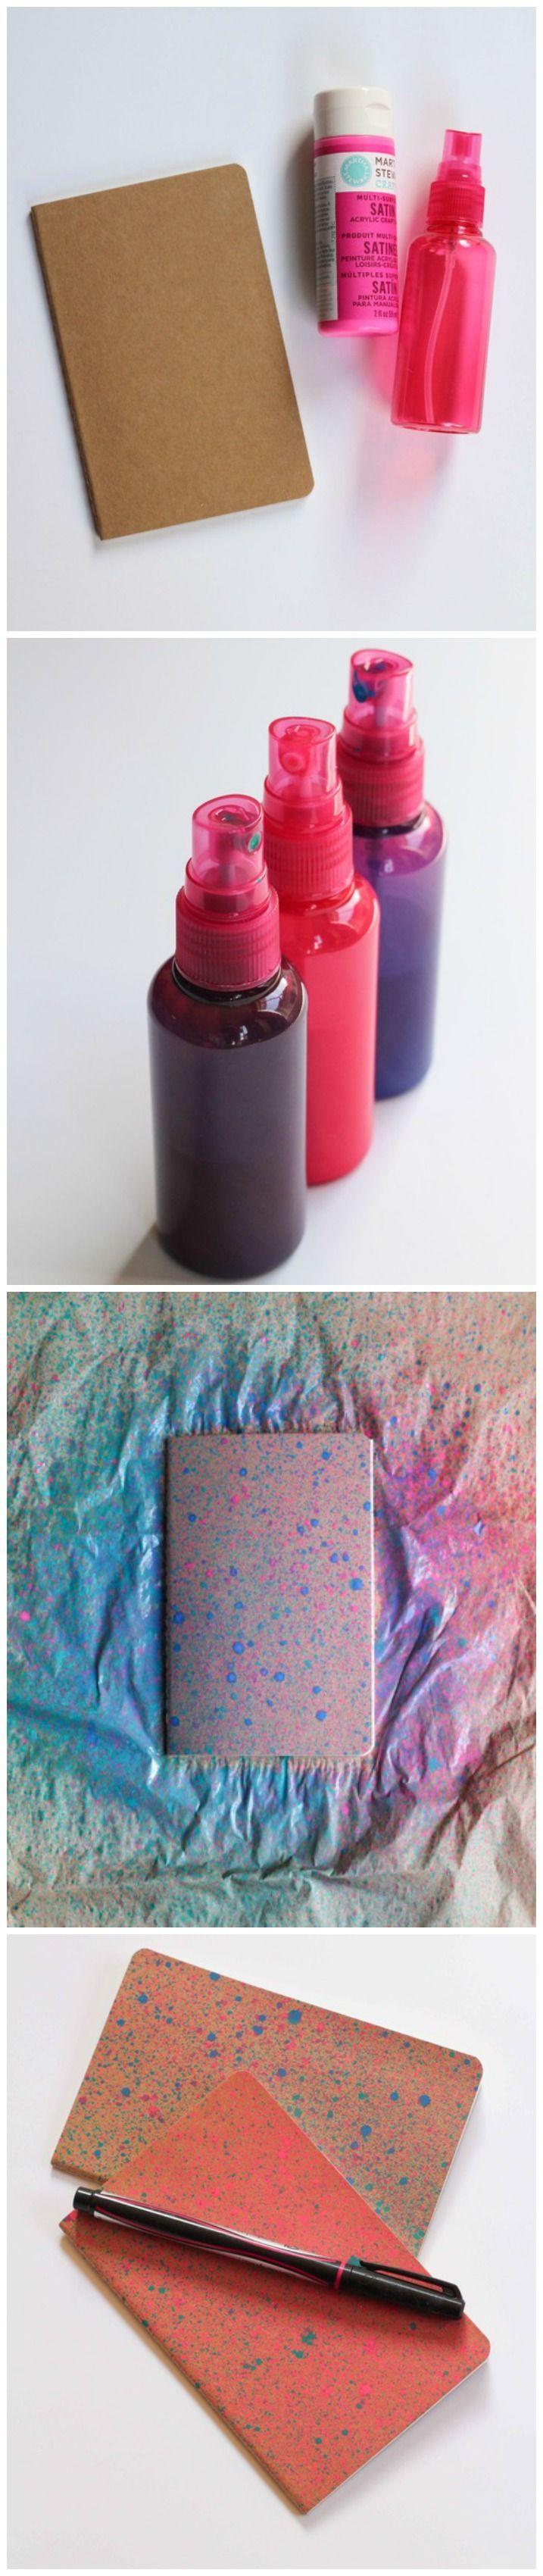 Best 25 Splatter Paint Canvas Ideas On Pinterest Splatter Paint Bedroom Gold Canvas And